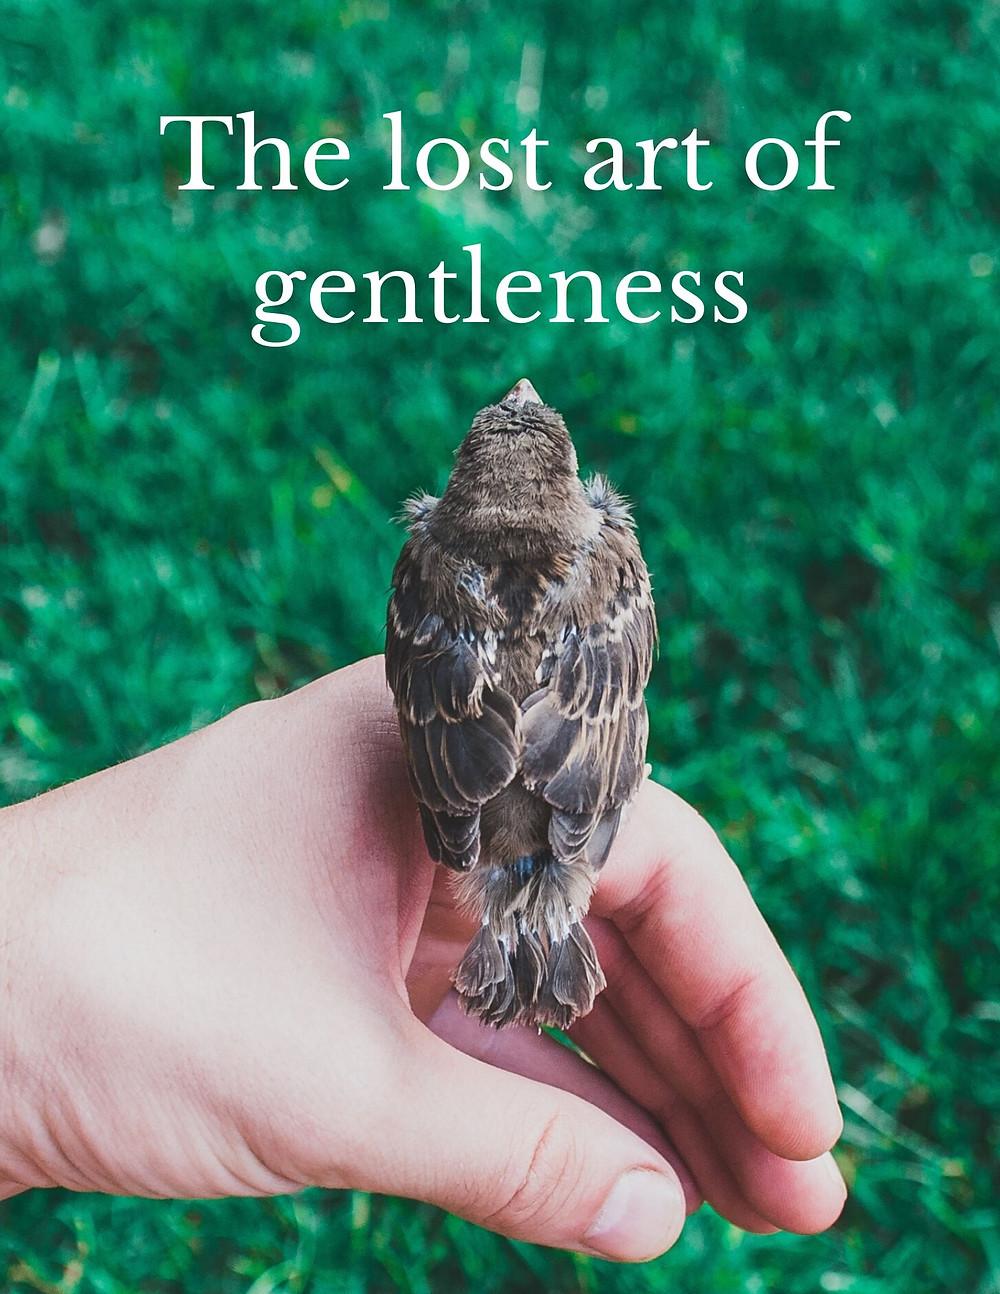 The lost art of gentleness